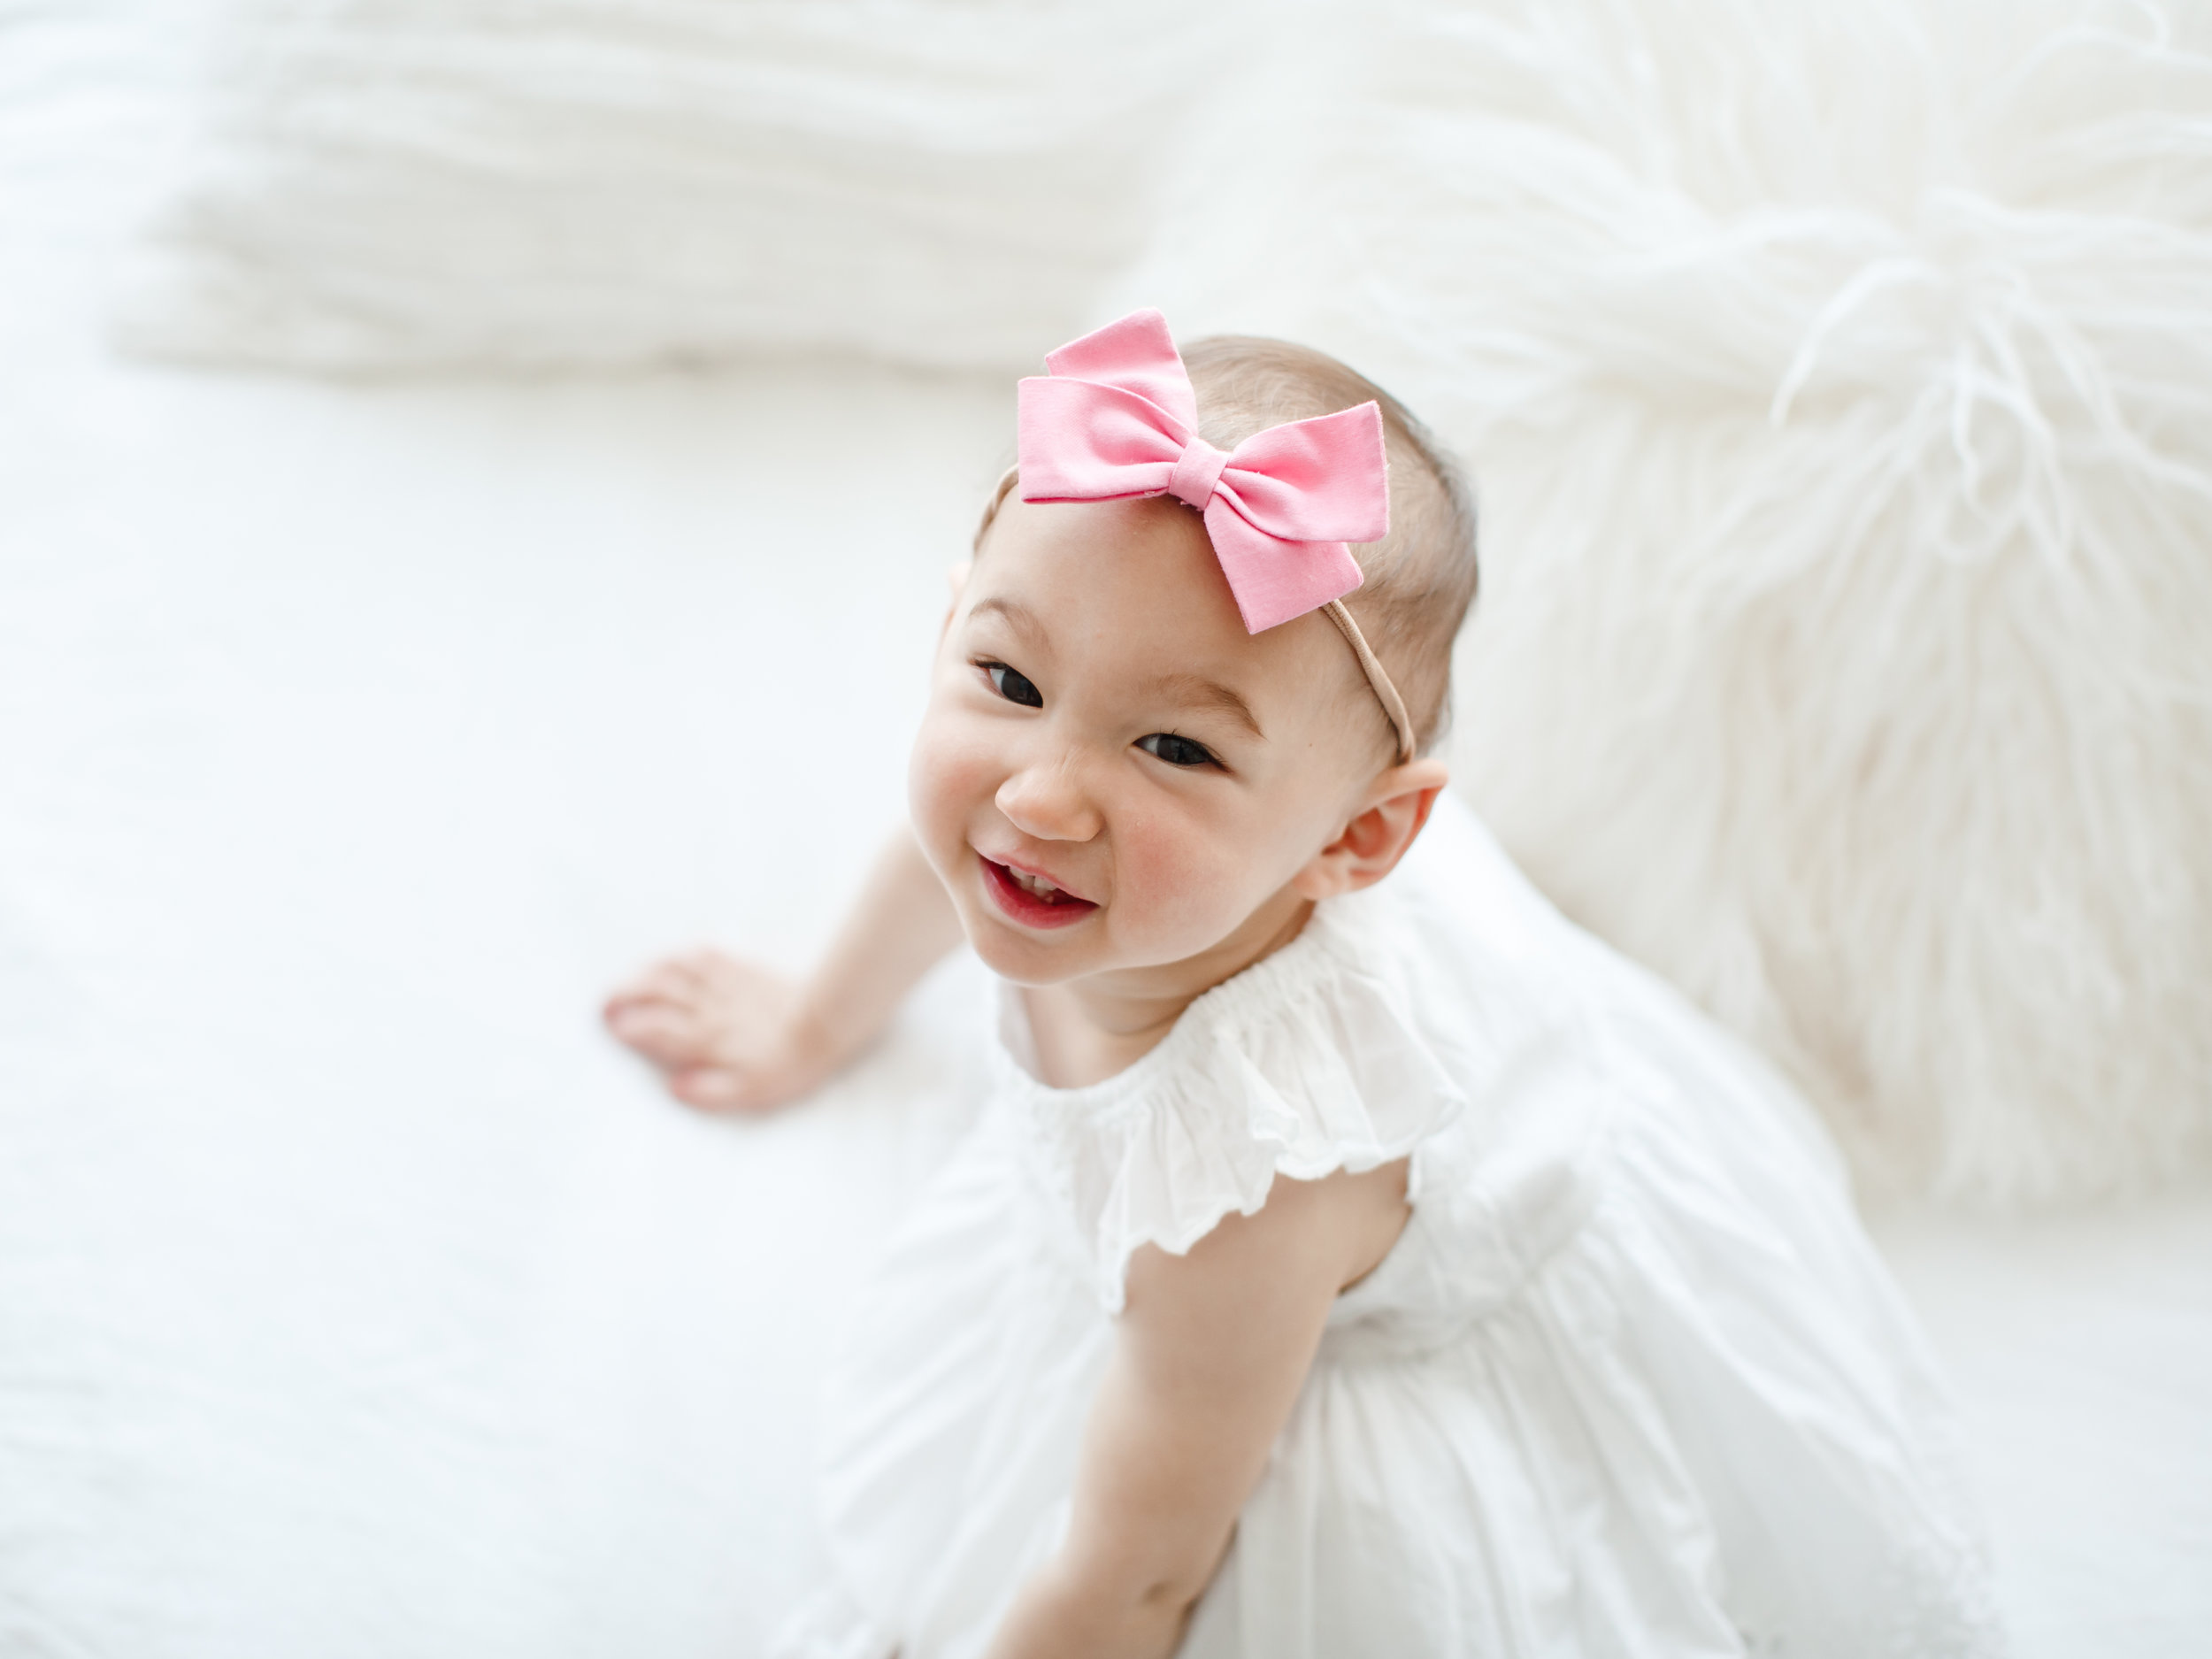 chicago baby lifestyle photographer jenny grimm baby birthday studio